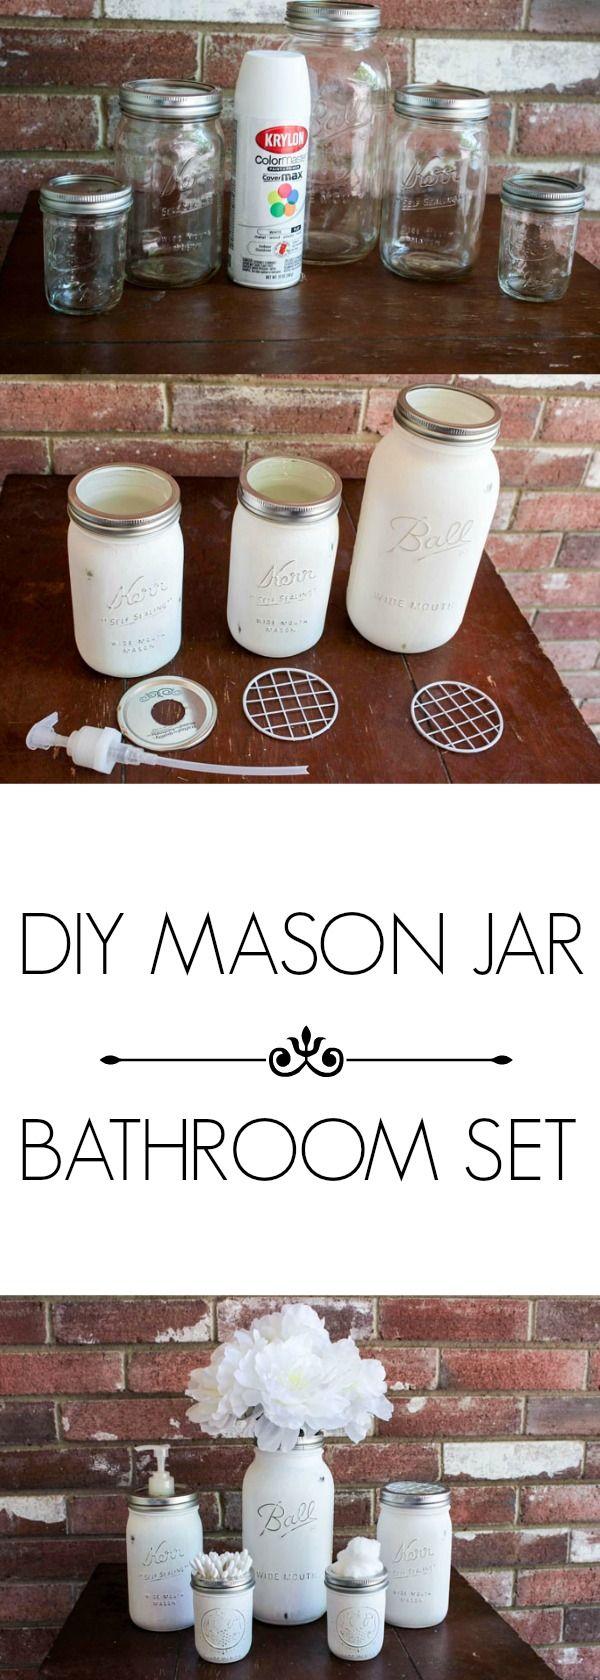 DIY MASON JAR BATHROOM SET PINTEREST